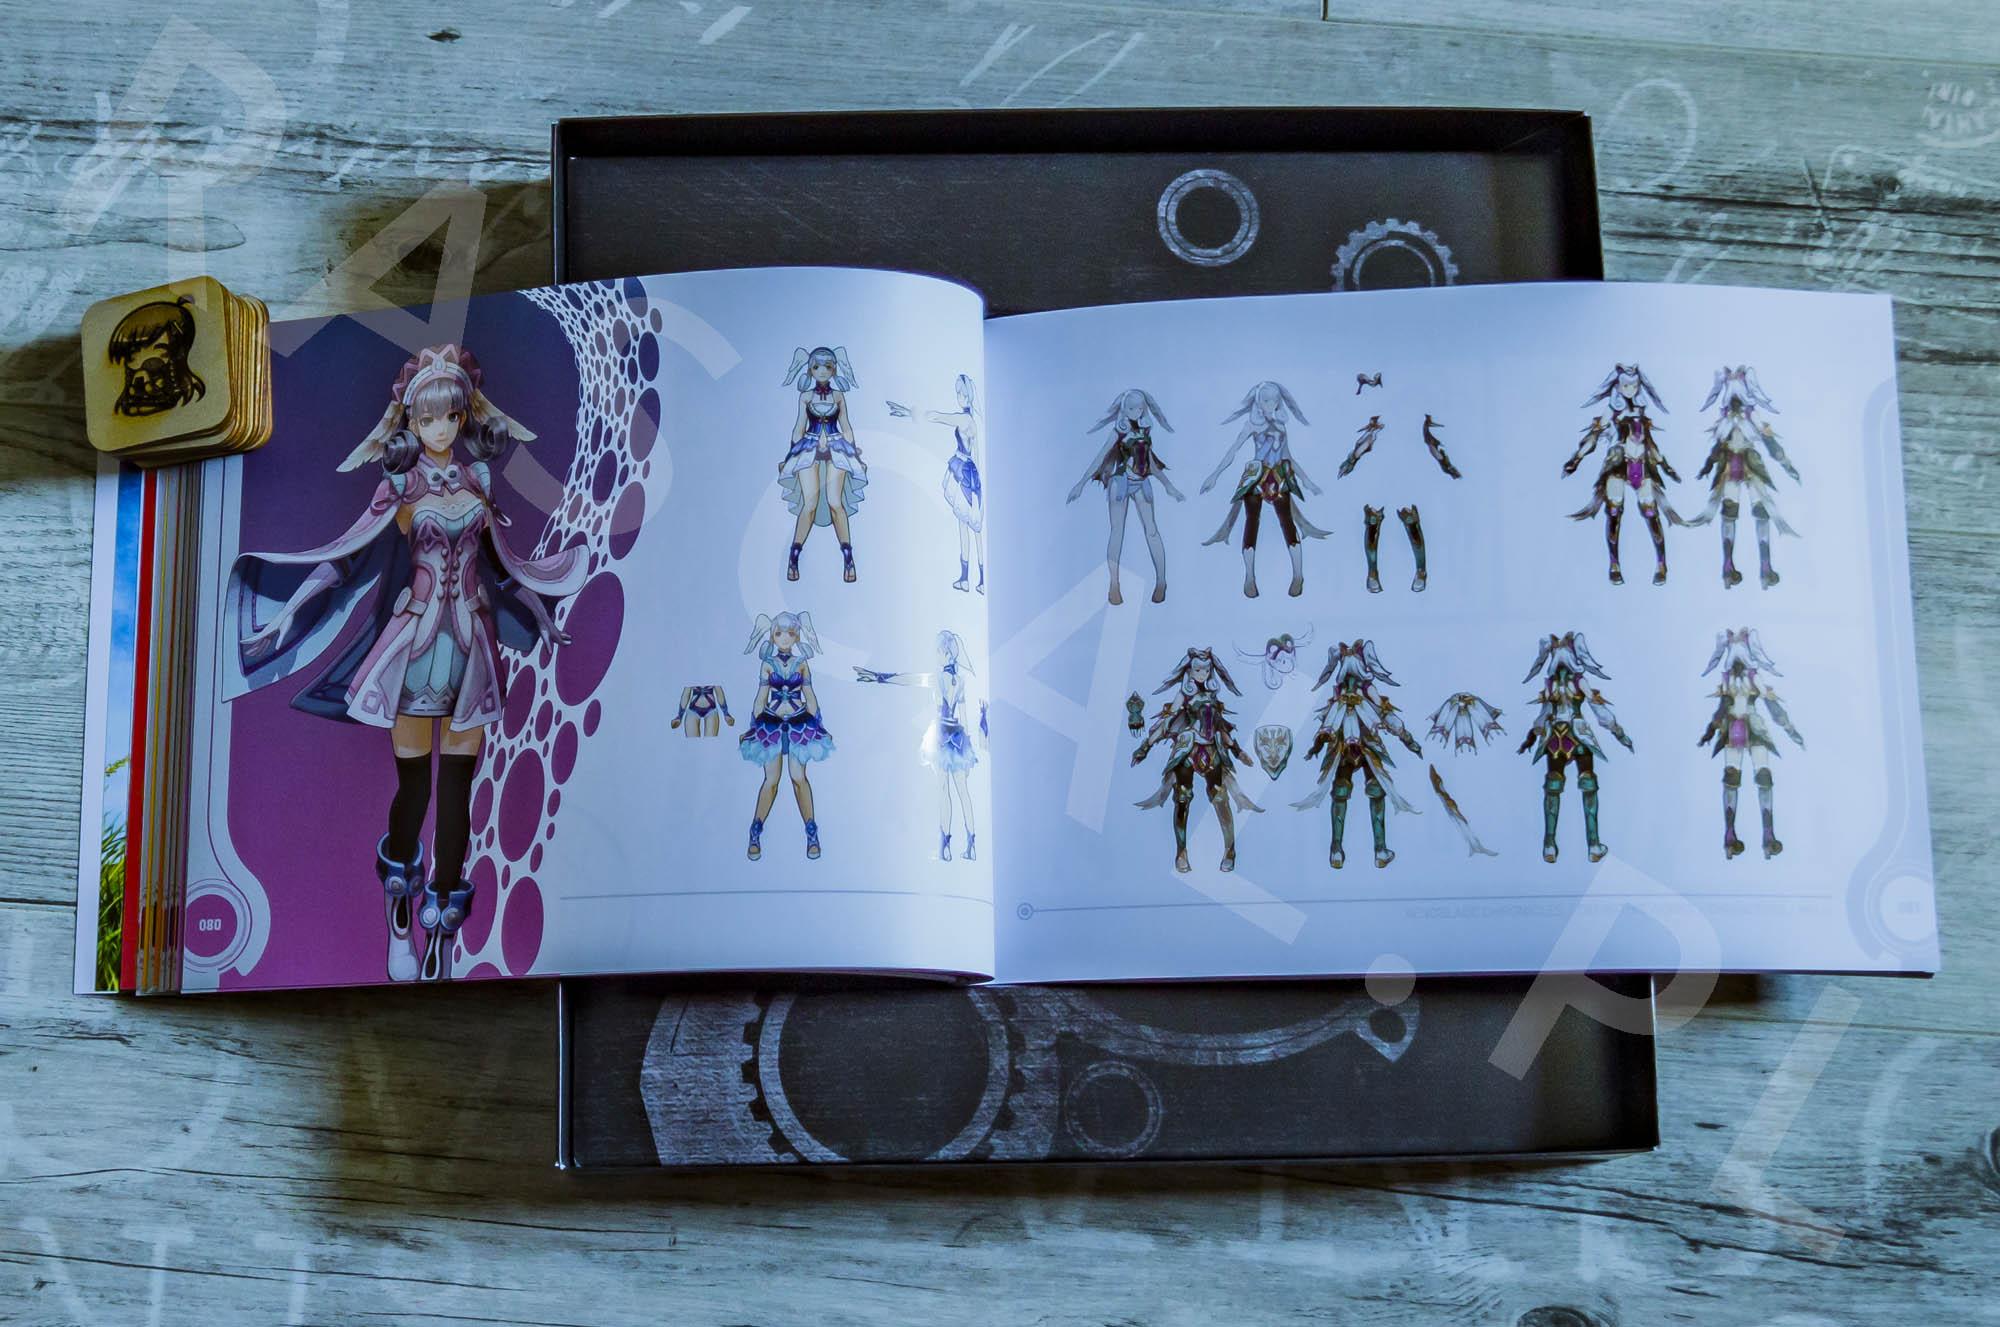 Xenoblade Chronicles Definitive Edition Collectors Set - Artbook - 09 - Melia - 02